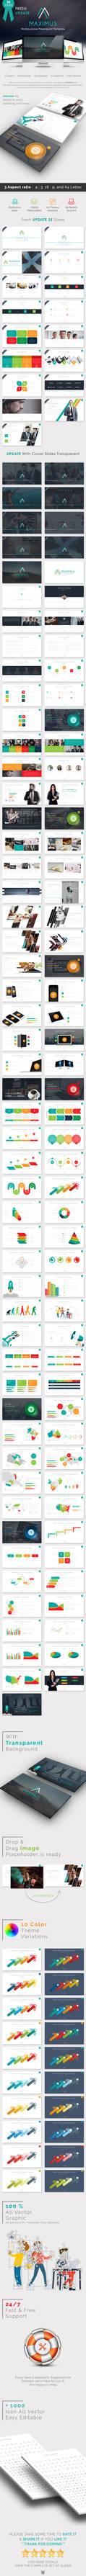 MAXIMUS - Business Powerpoint Presentation Templat